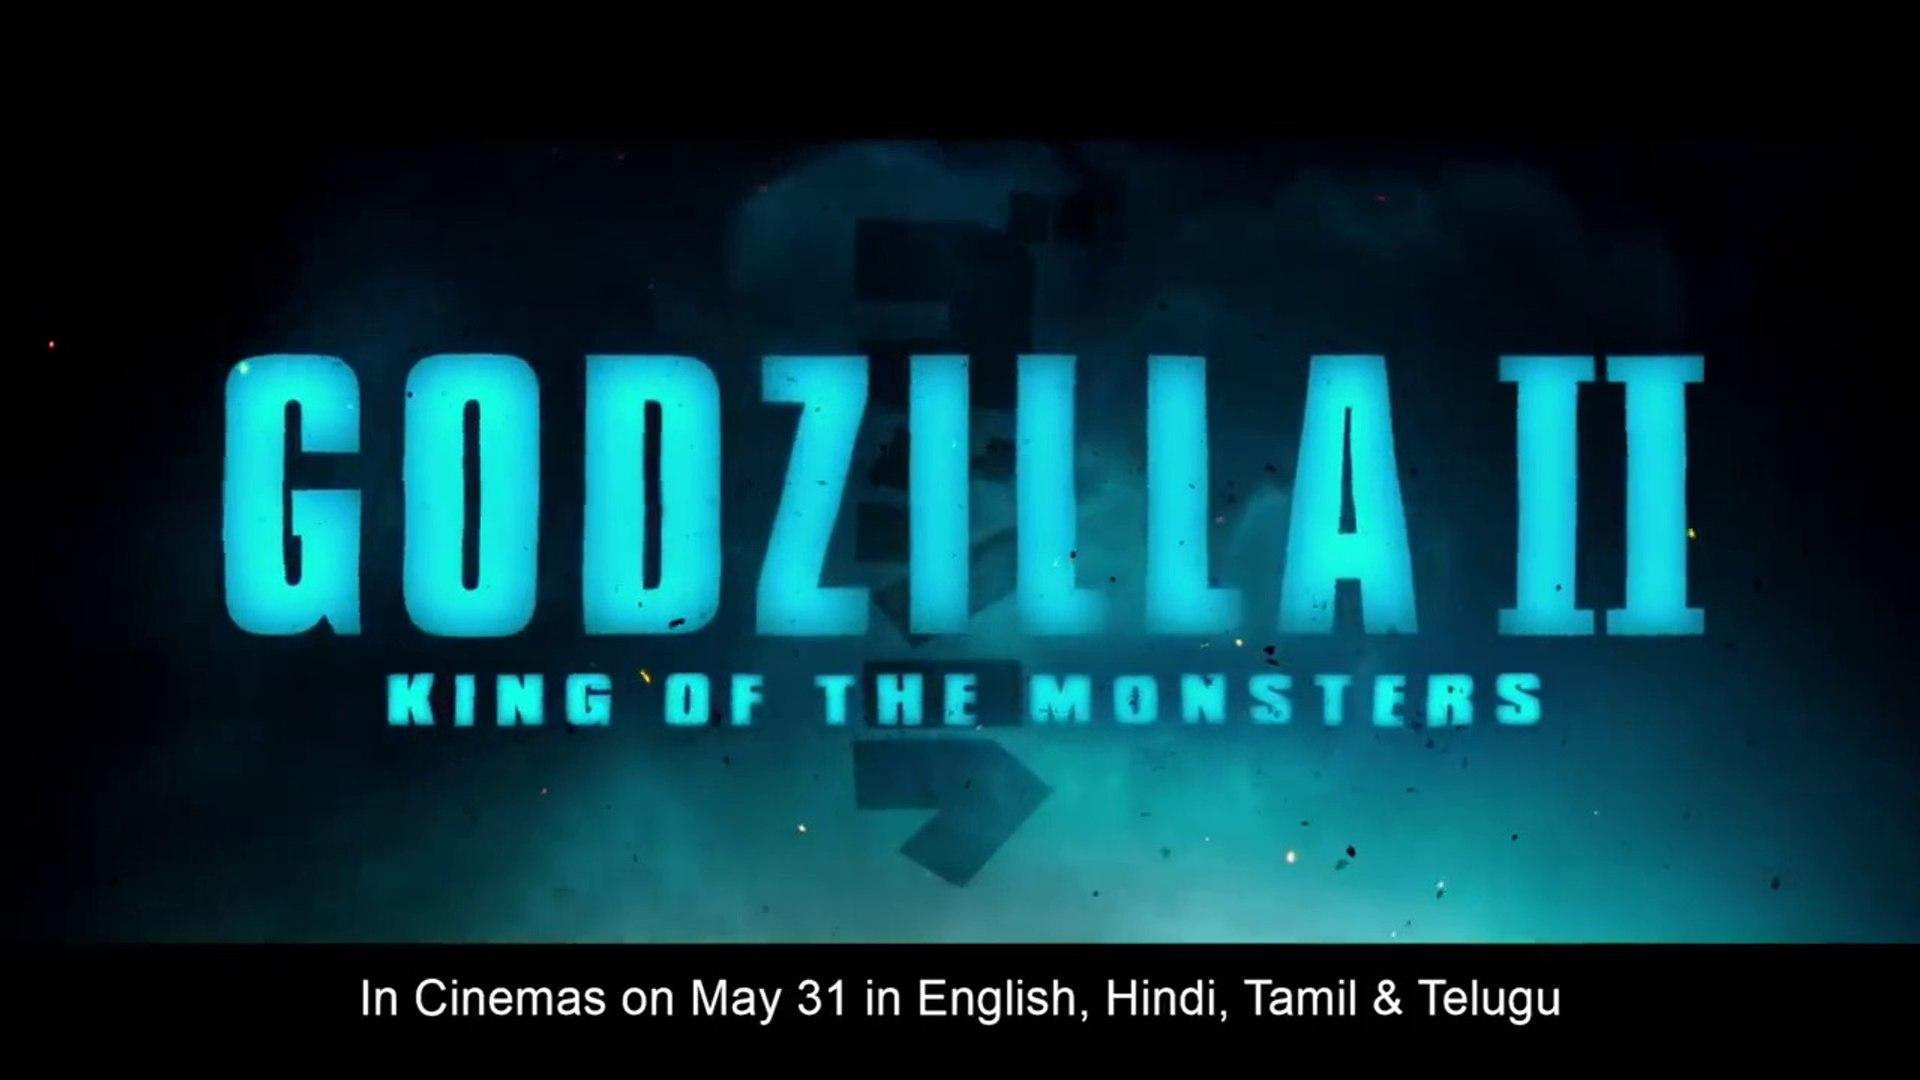 Godzilla 2 Wallpaper Posted By Ryan Anderson